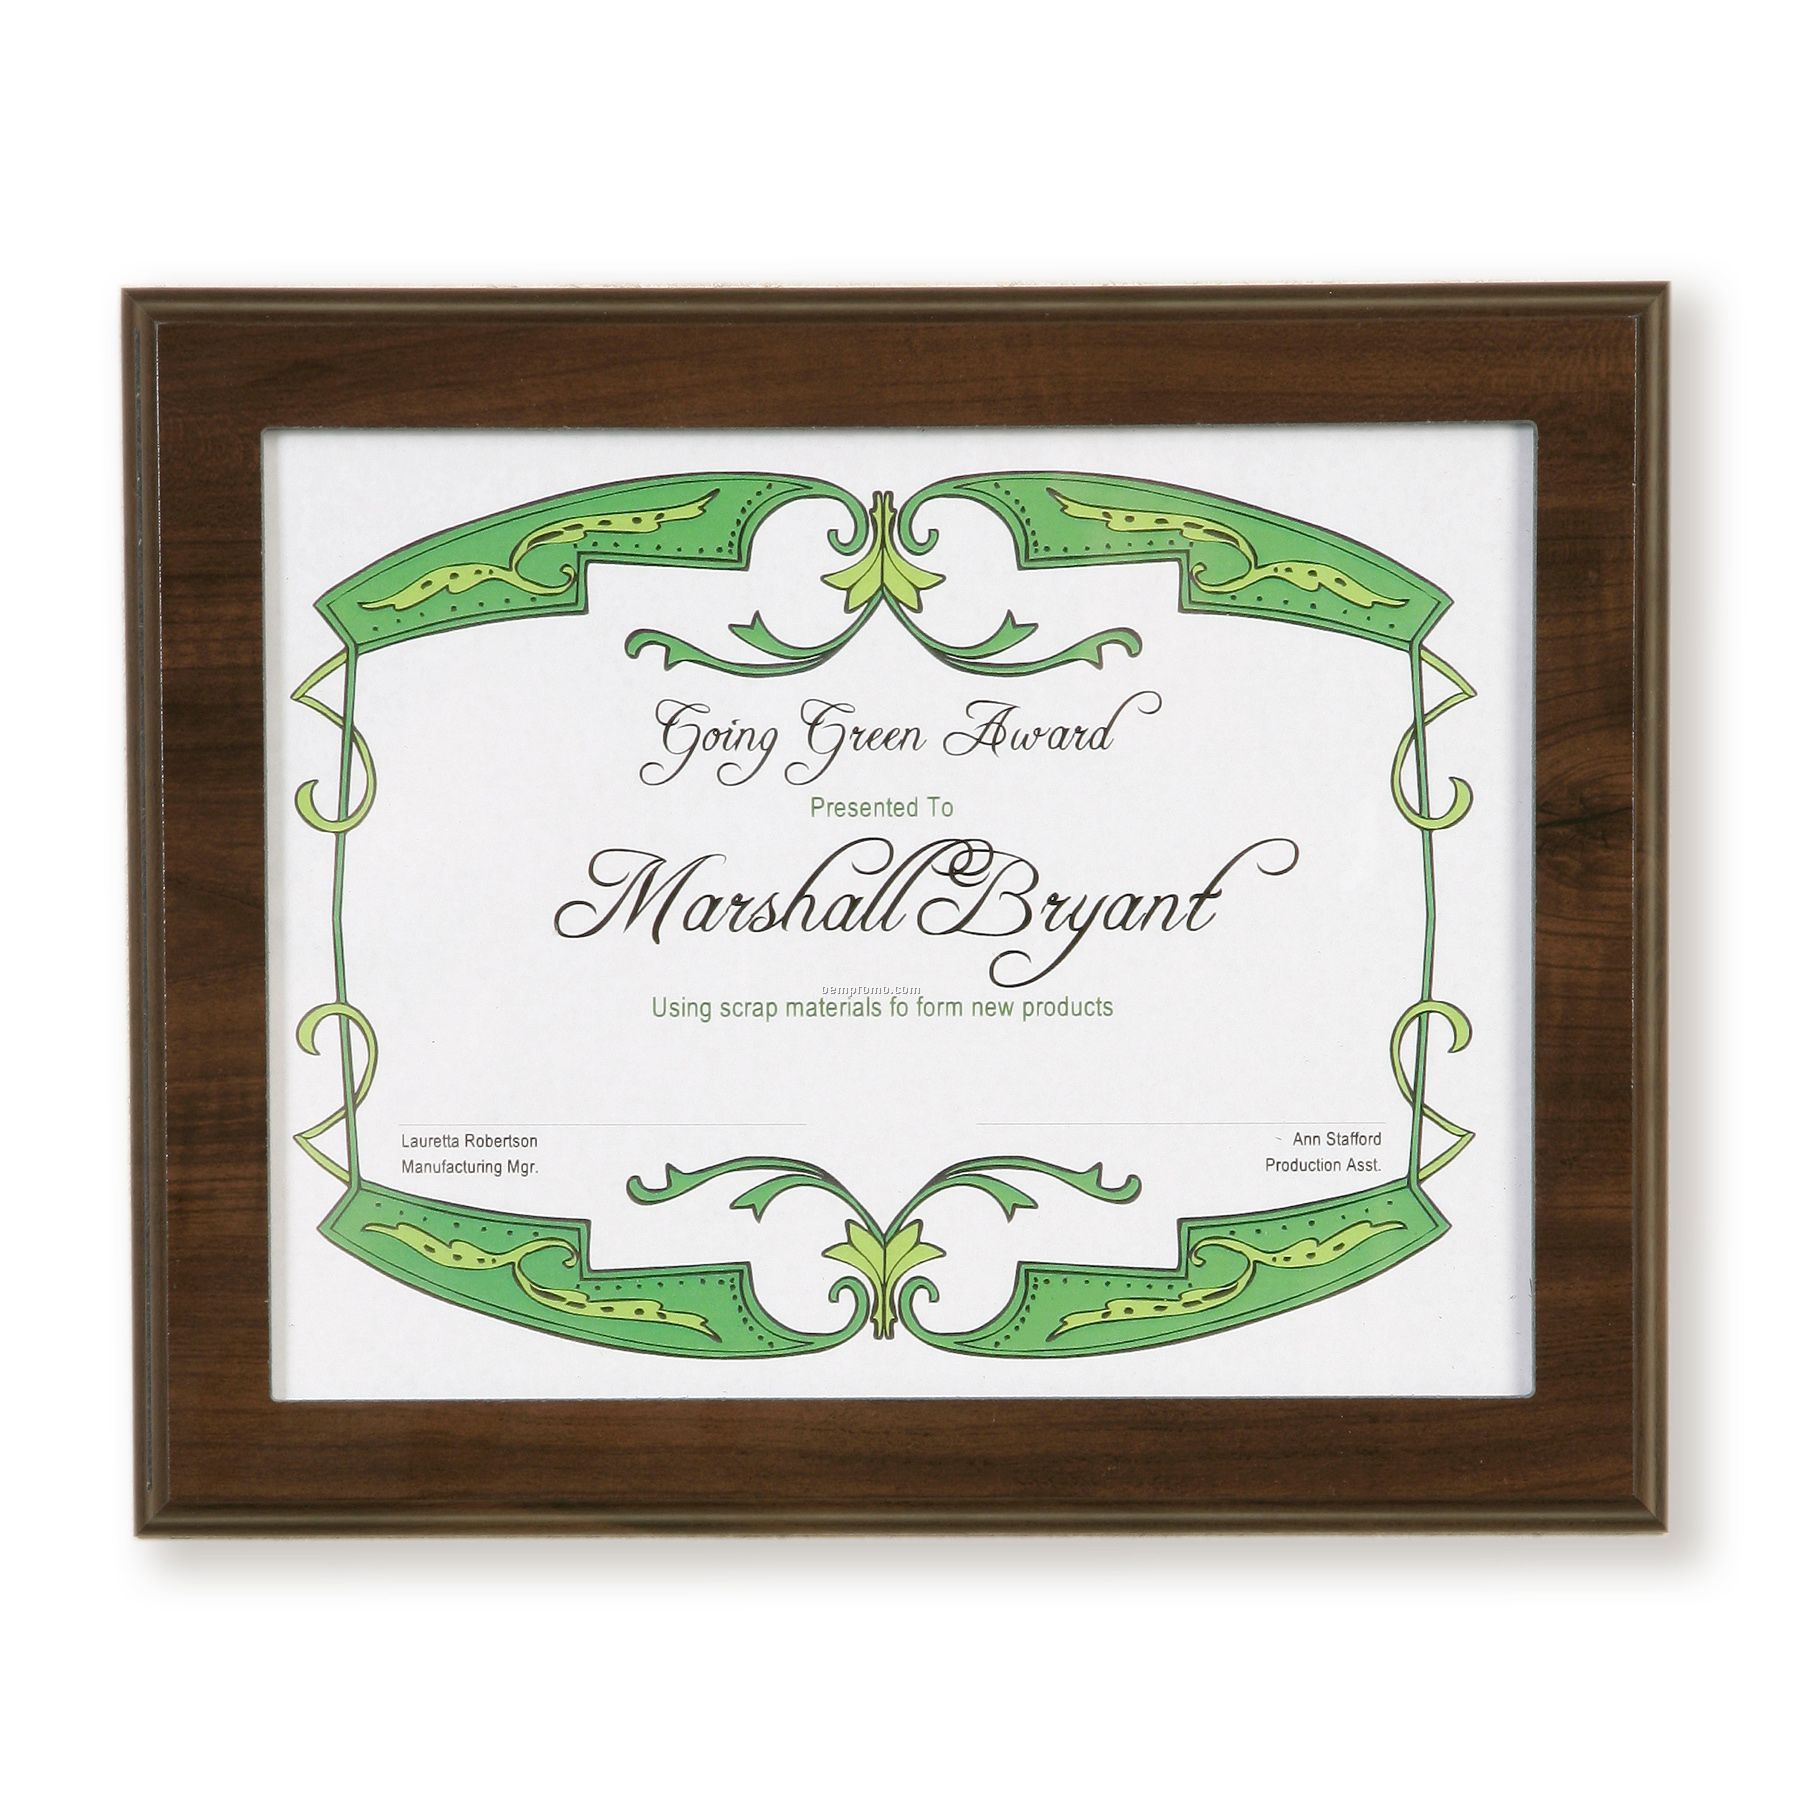 Prestige Simulated Walnut W/ Clear Acrylic Certificate Frame